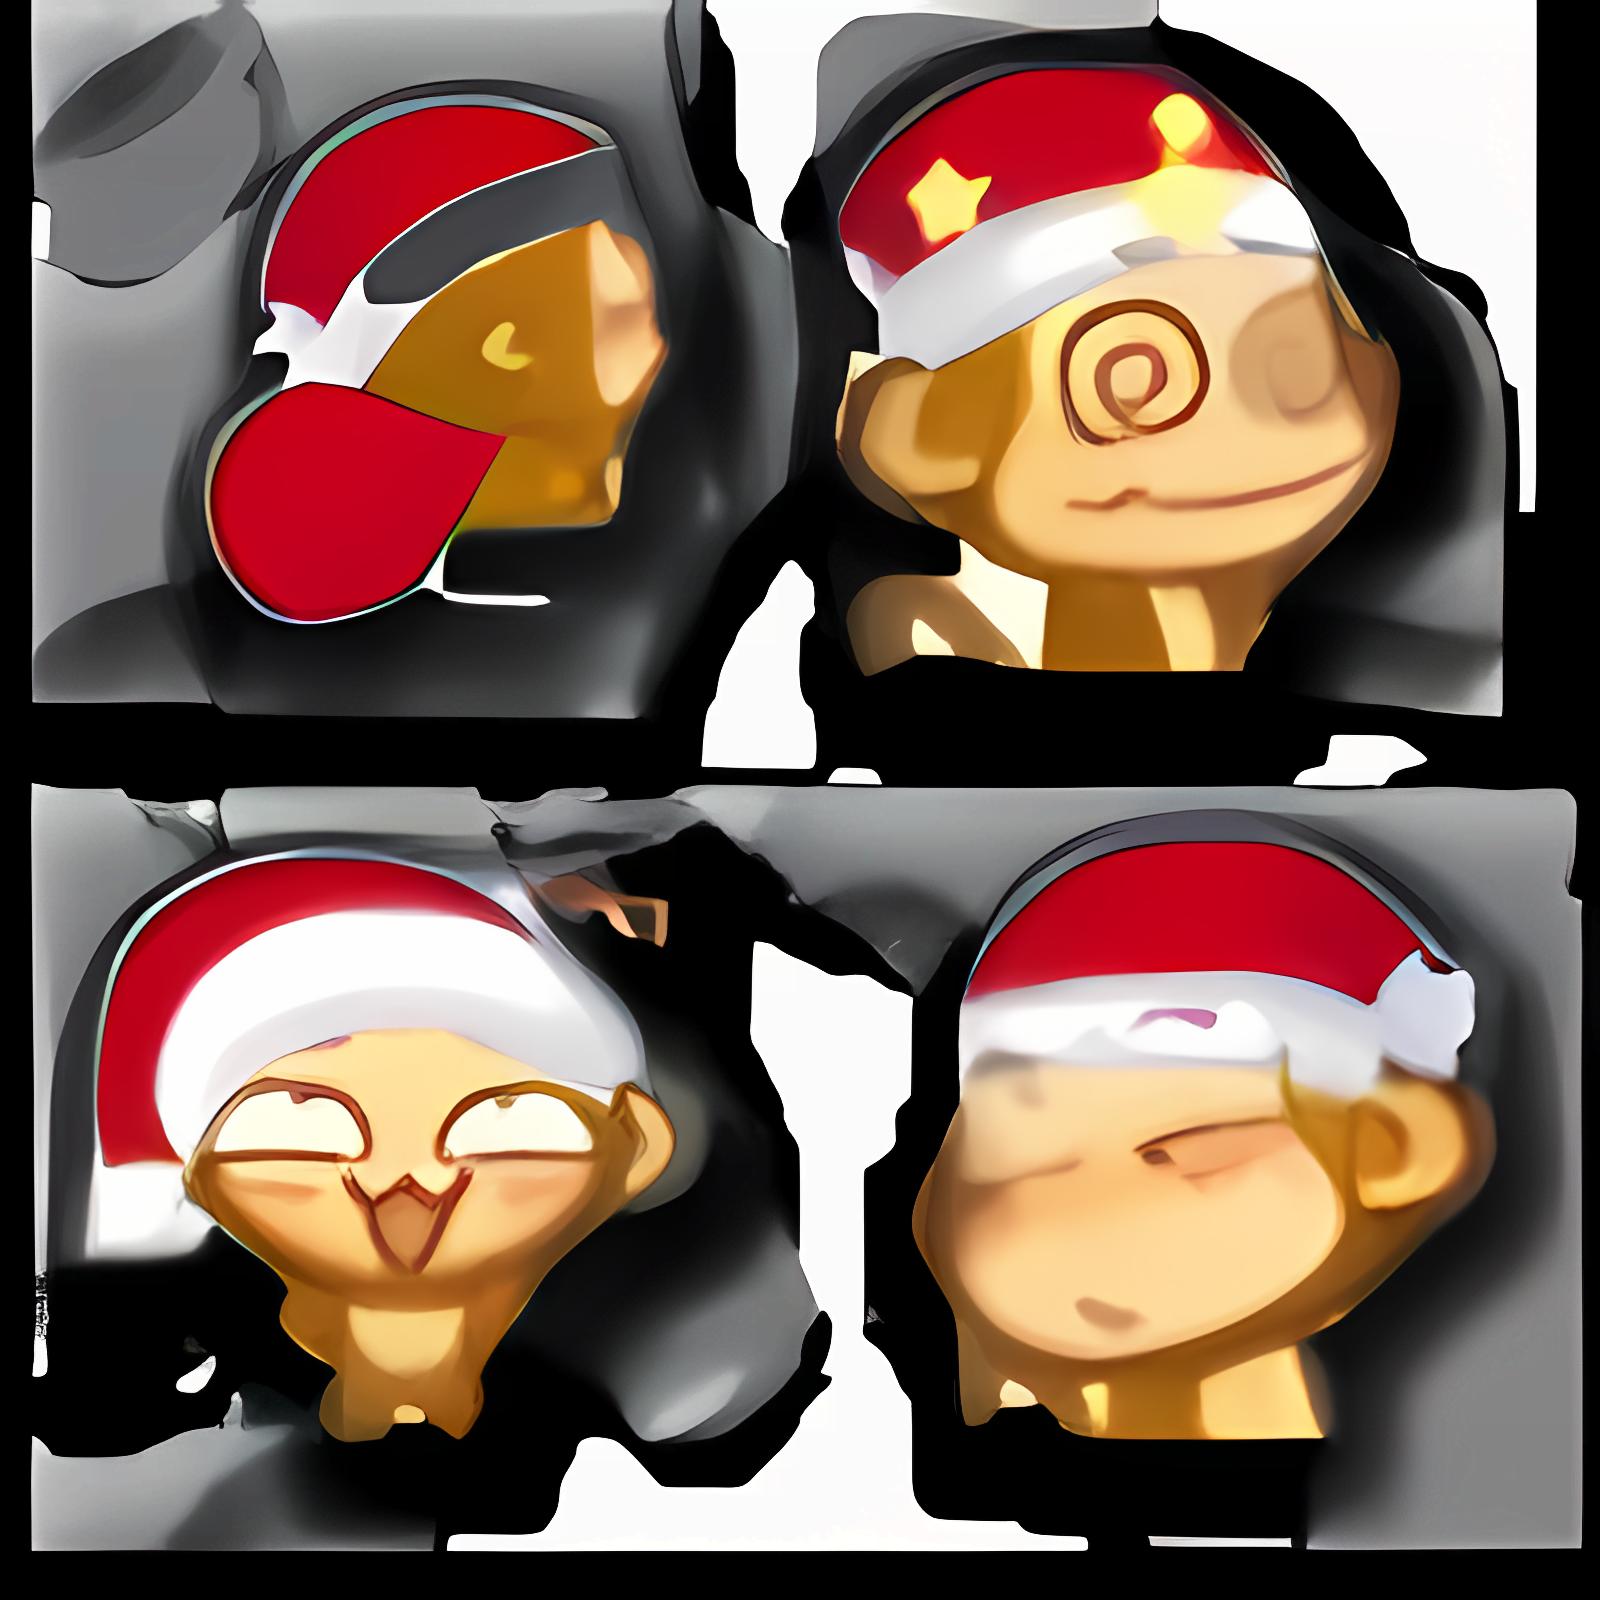 Windows Live Messenger Emoticons